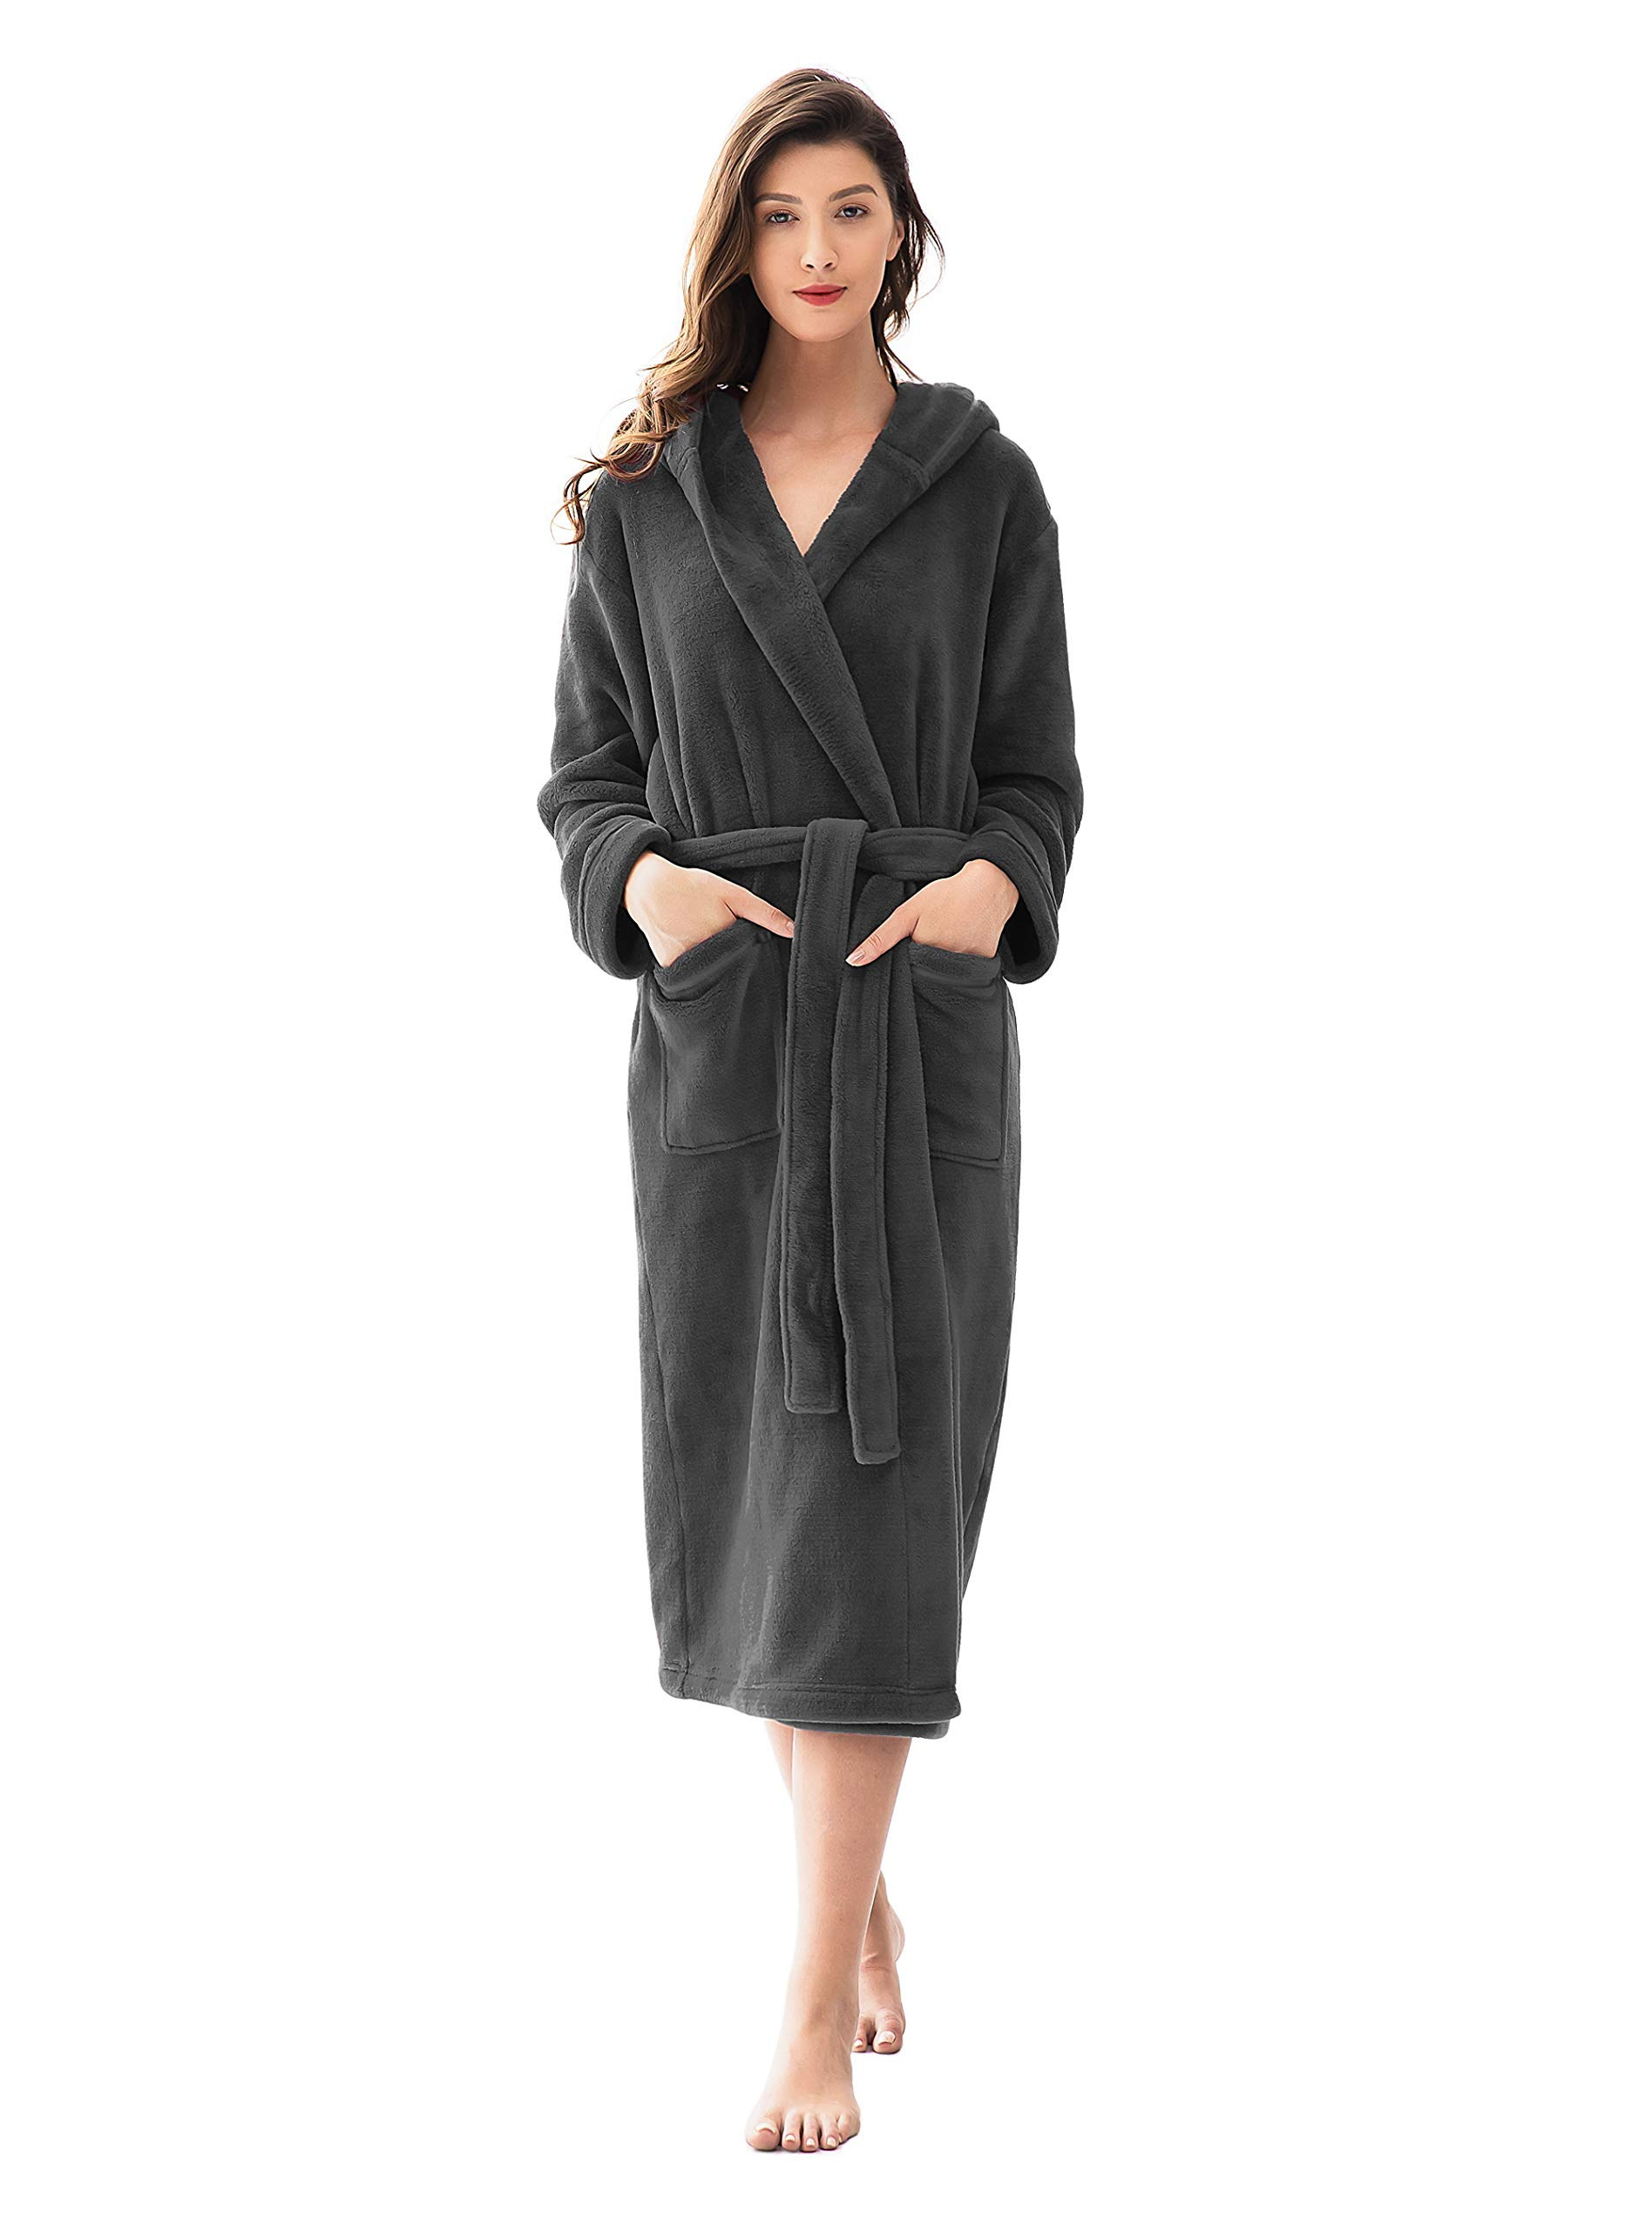 Women's Plush Robe, Fluffy Fleece Robe with Hood Long Soft Warm Bathrobe House Coat S~XL